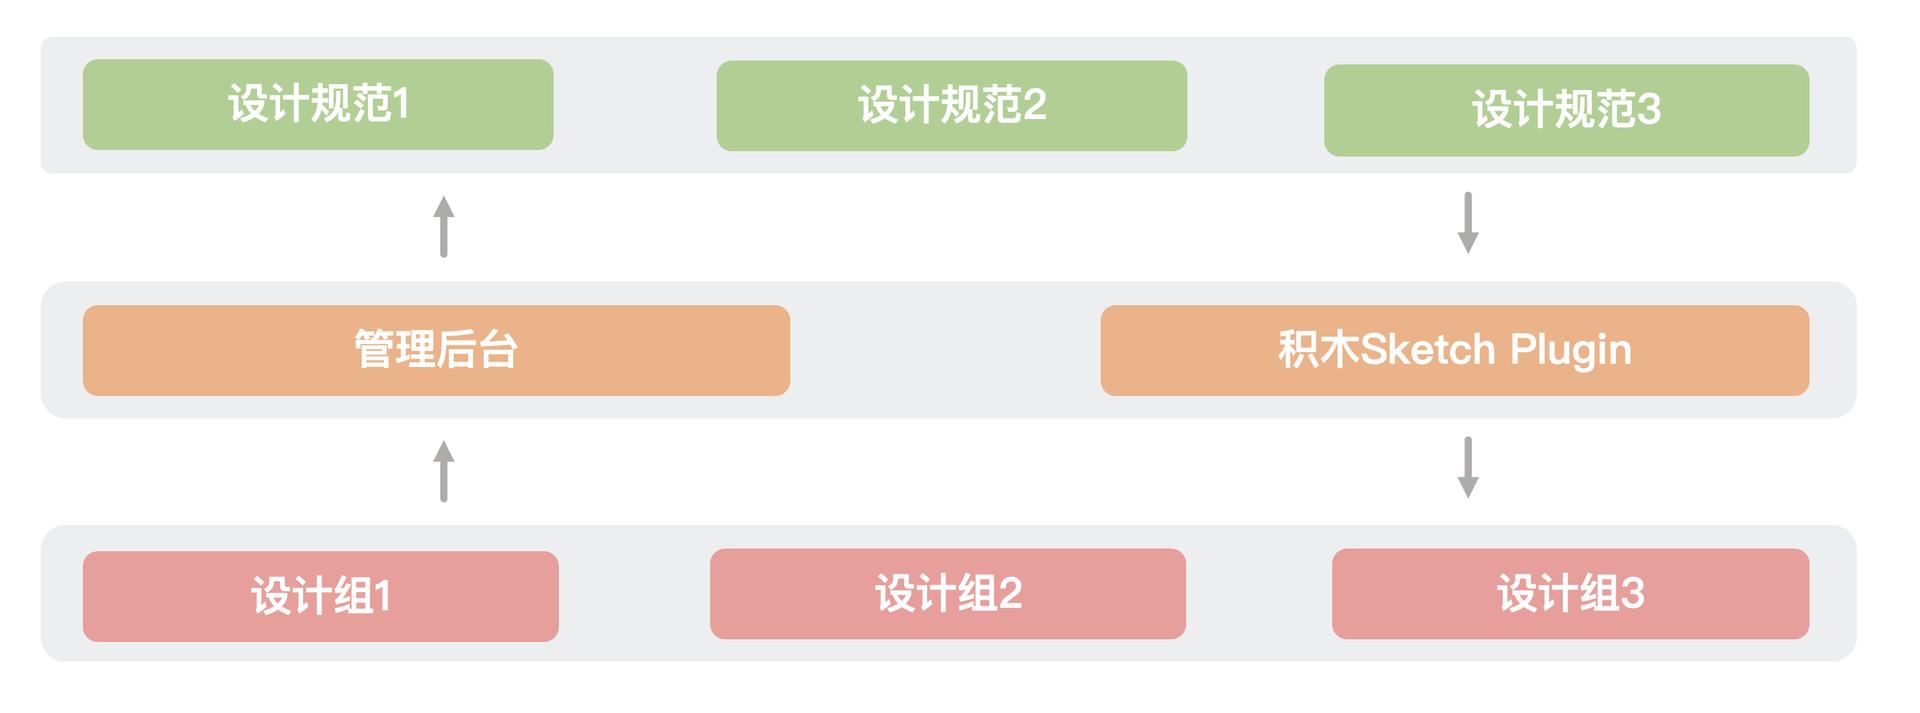 积木Skecth Plugin平台化示意